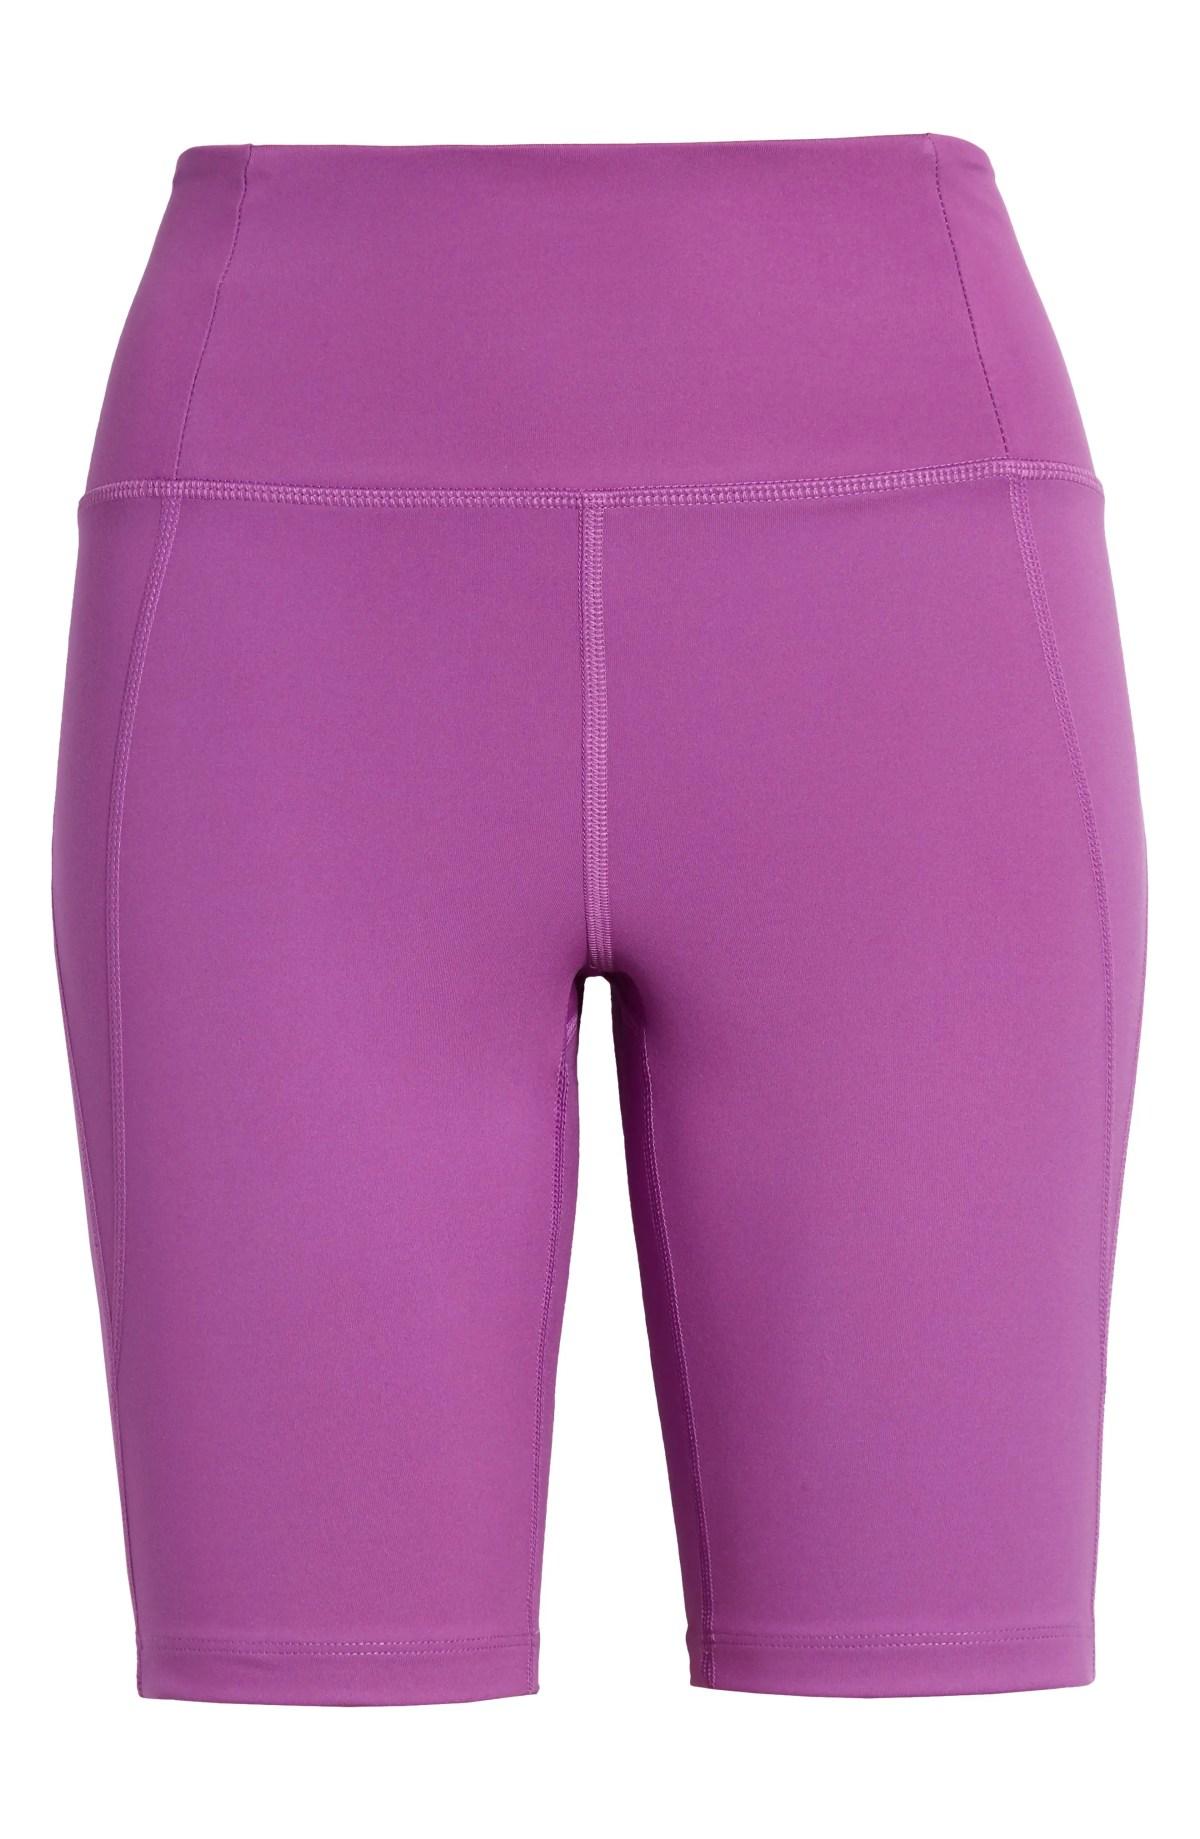 GIRLFRIEND COLLECTIVE High Waist Bike Shorts, Main, color, WILDFLOWER